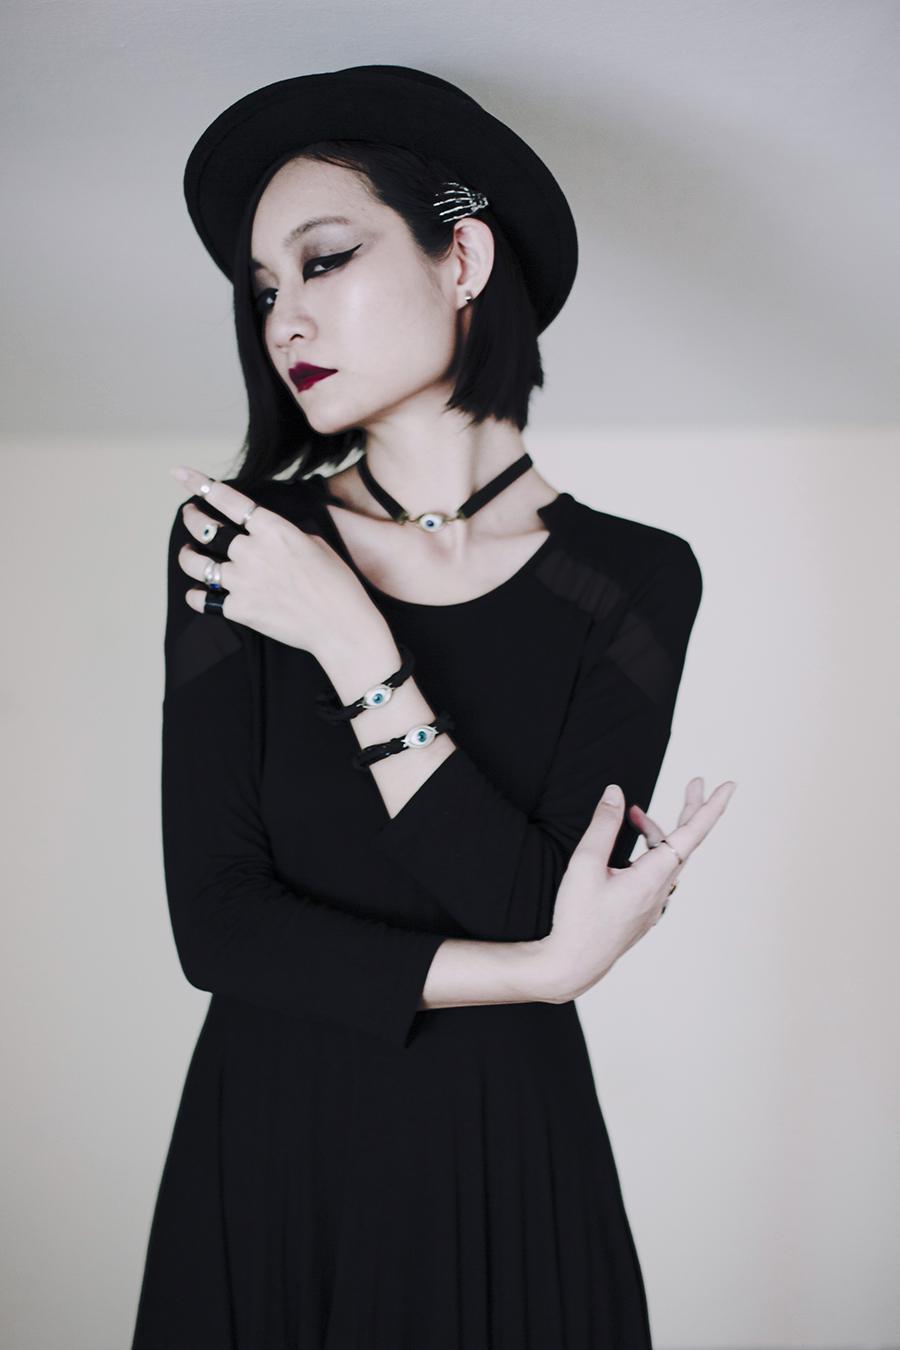 Teenage Angst Halloween Outfit: Dresslily black skull dress, Dresslily eye bracelets necklace, Dresslily rings.